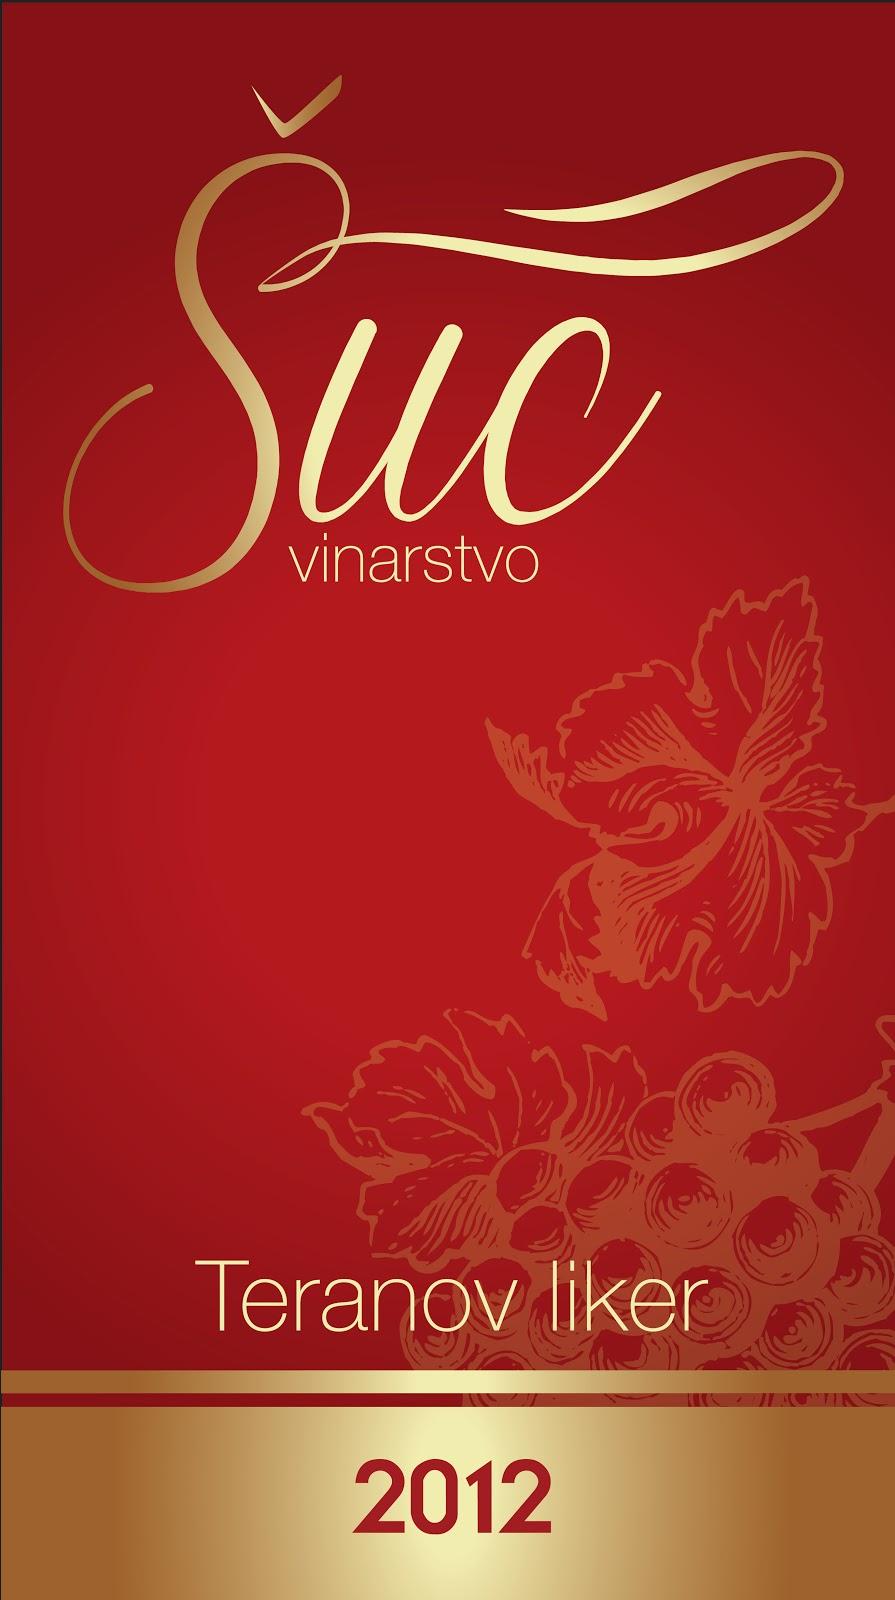 Wine label for Šuc winery